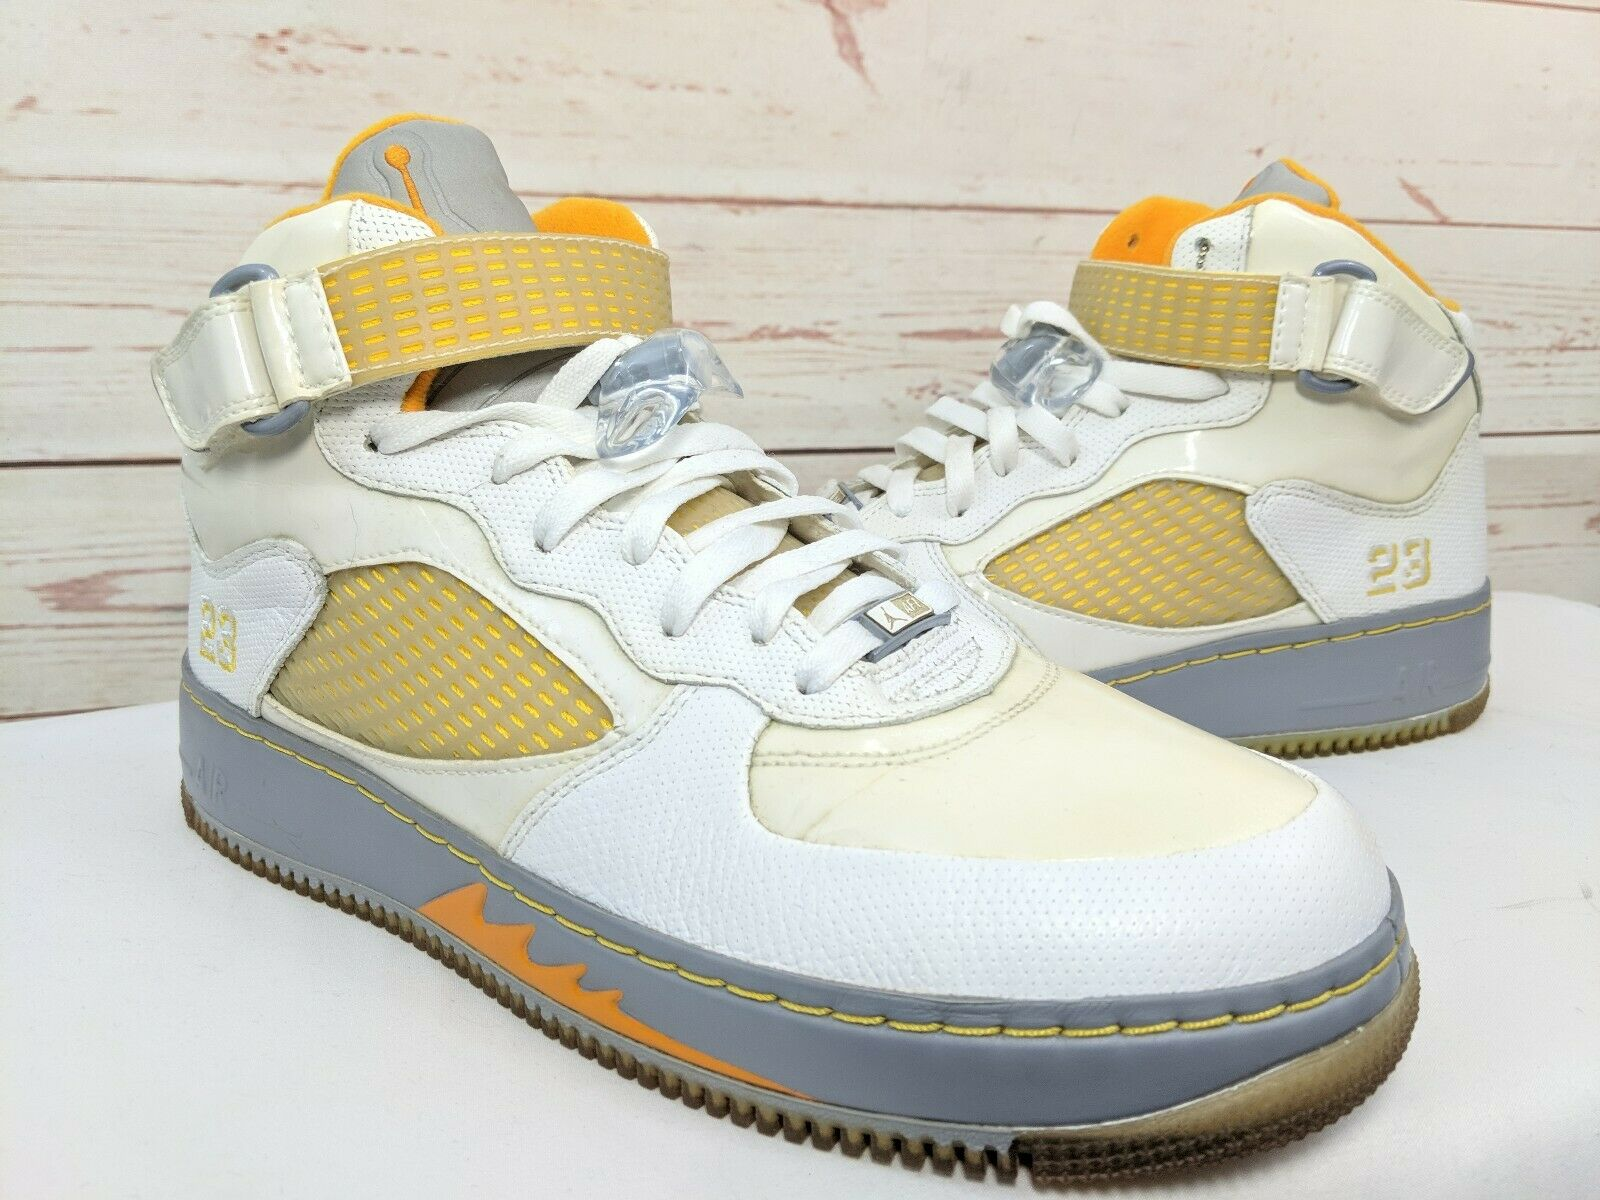 Nike Air Jordan Fusion Mens Size US 12 White orange shoes 318608-181